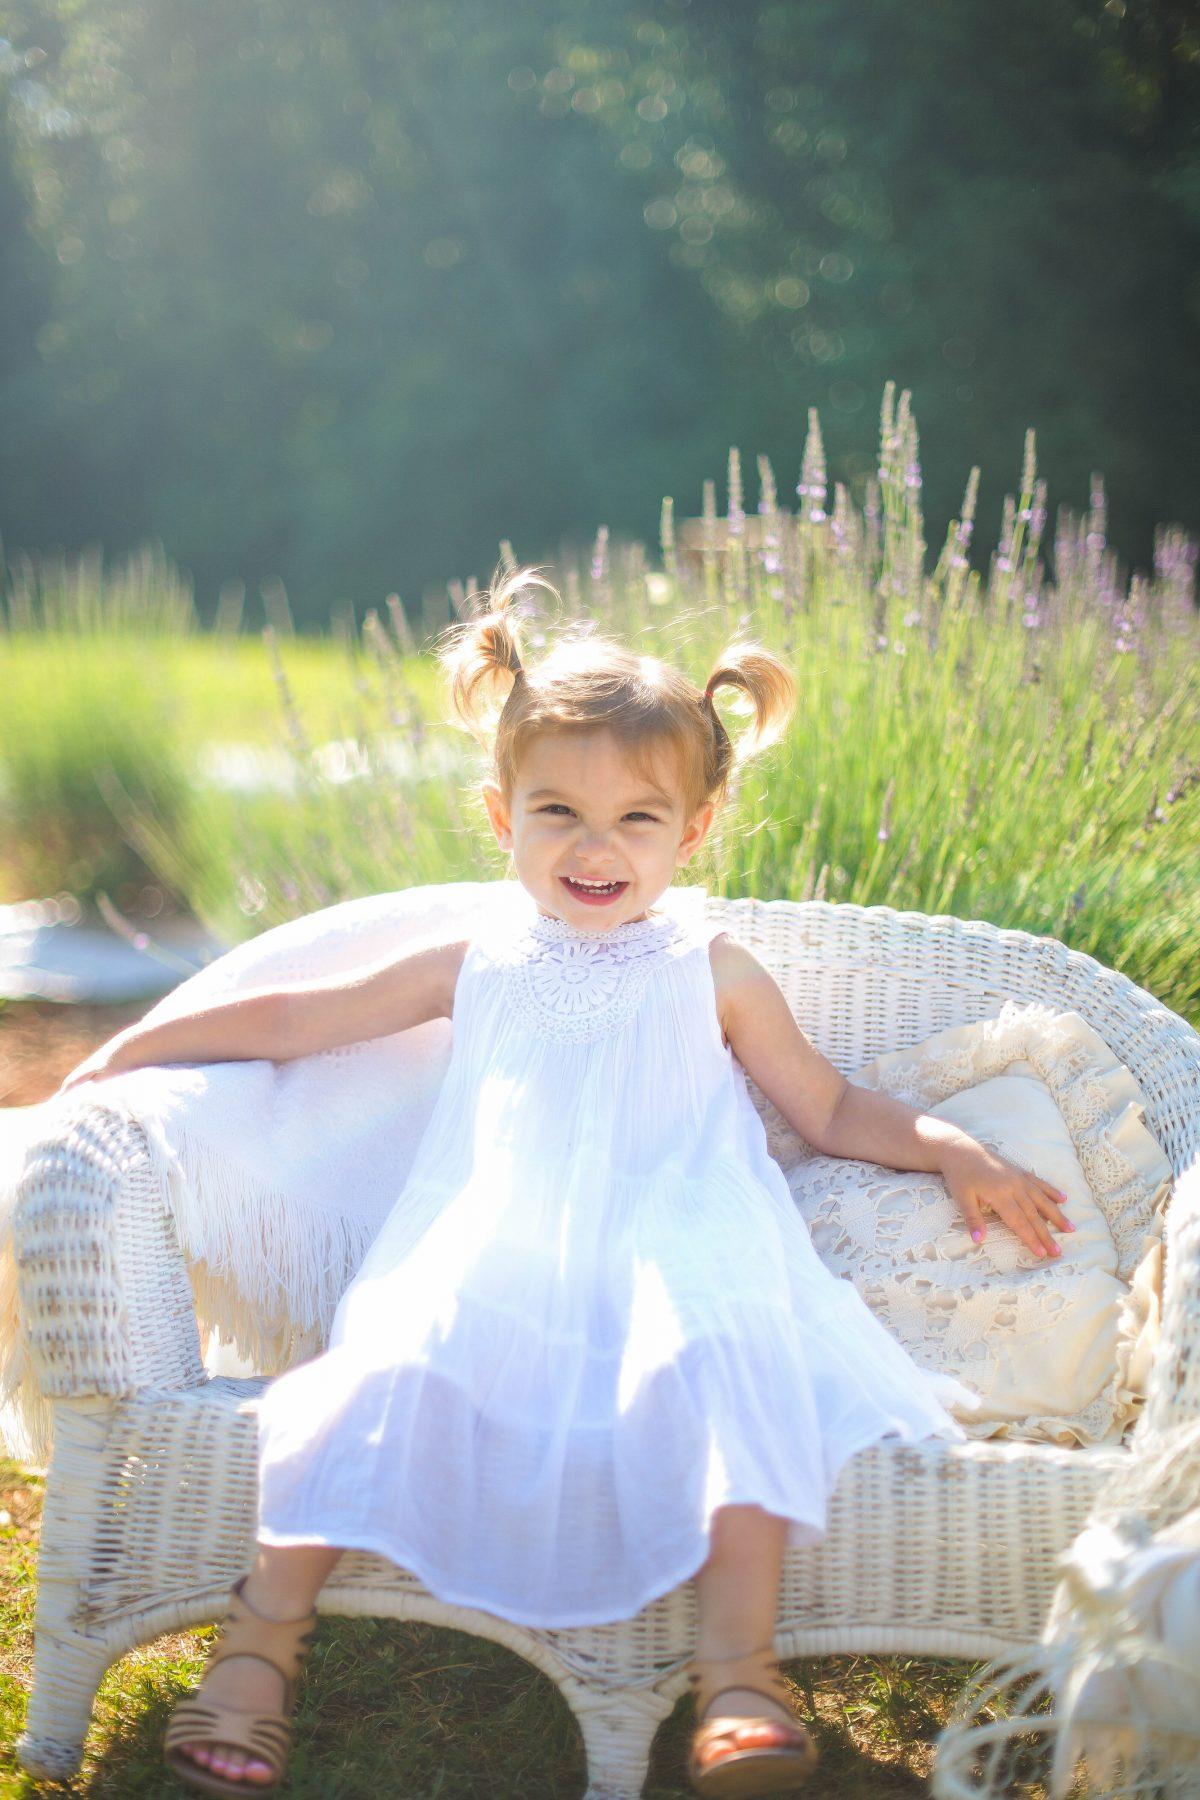 lavender farm family photo session and maternity photos